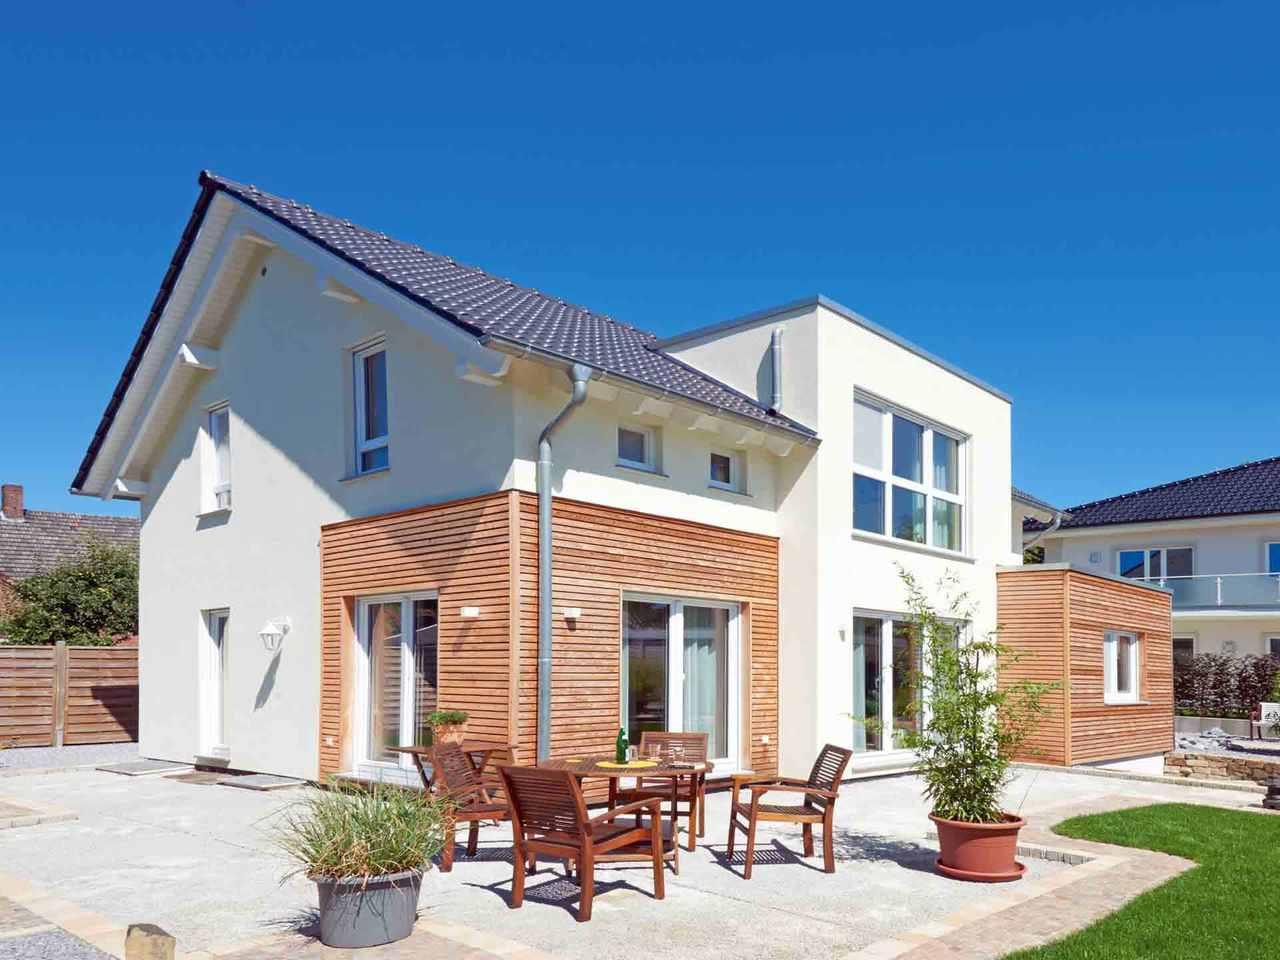 Einfamilienhaus Solaris - Fingerhut Haus Terrasse